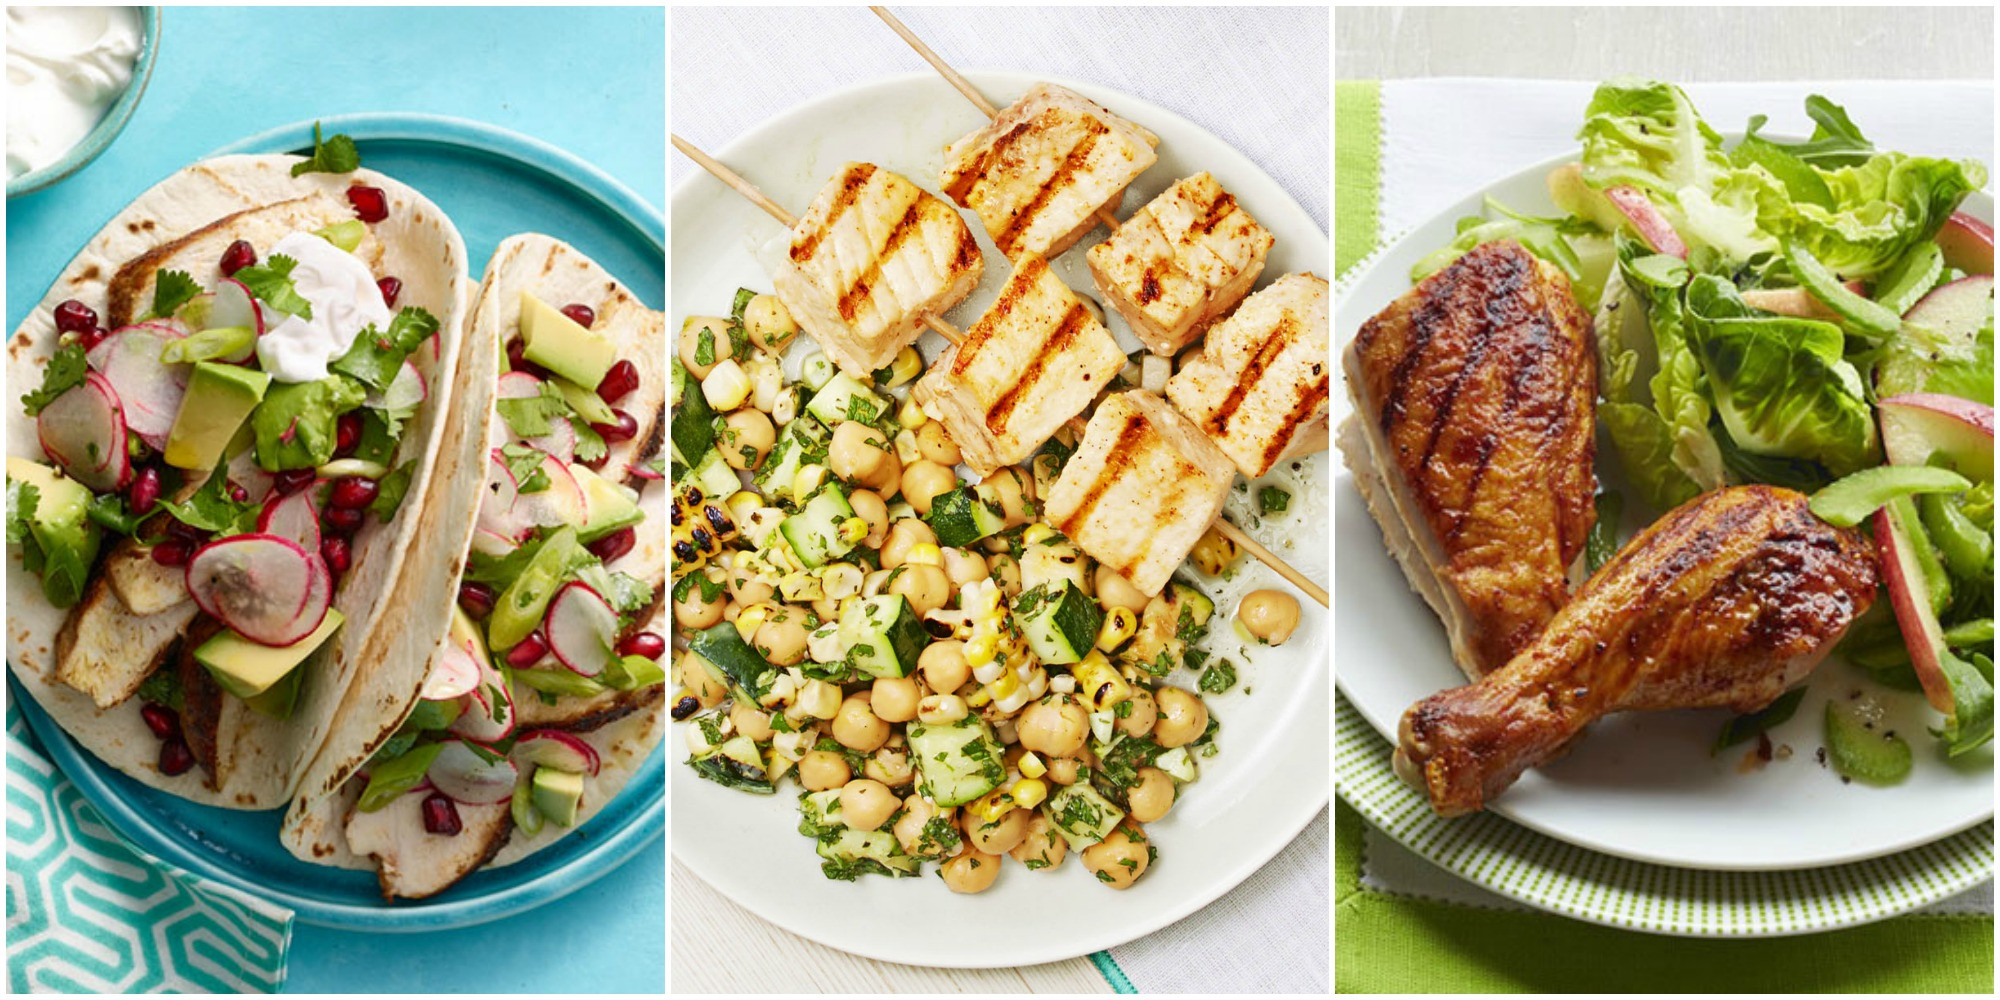 Summertime Dinner Ideas  60 Best Summer Dinner Recipes Quick and Easy Summer Meal